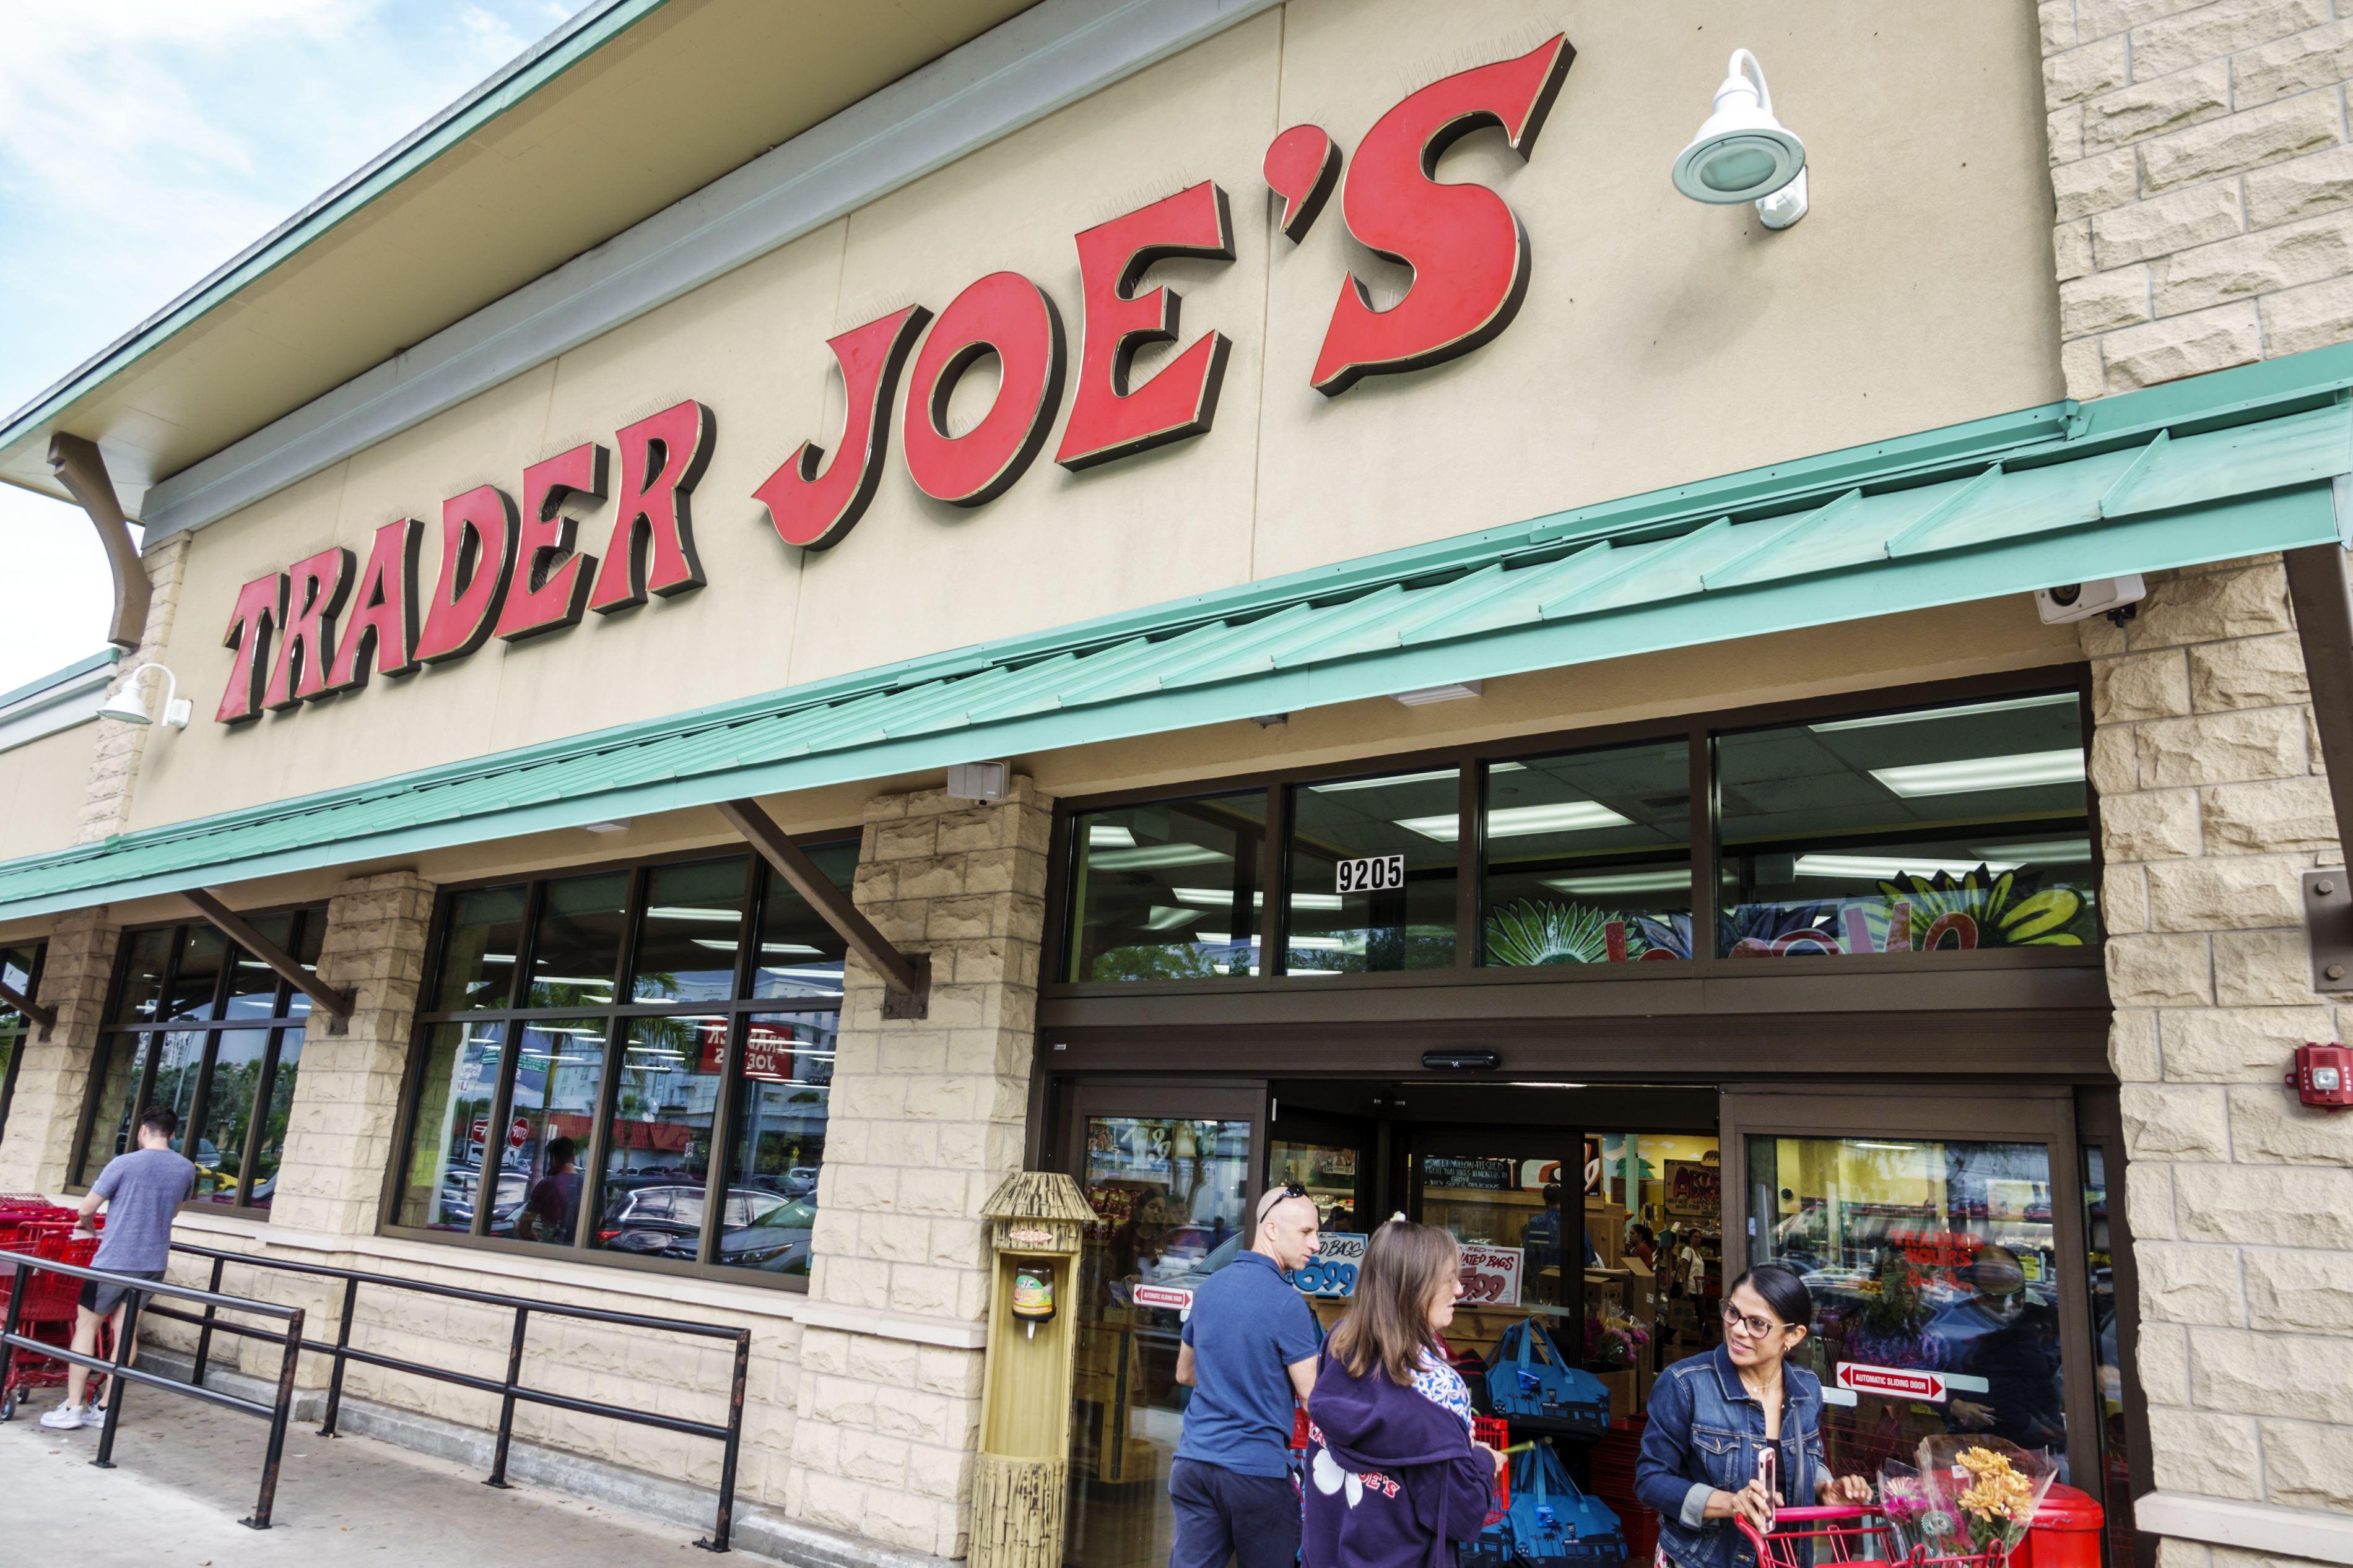 Miami, Trader Joe's Entrance